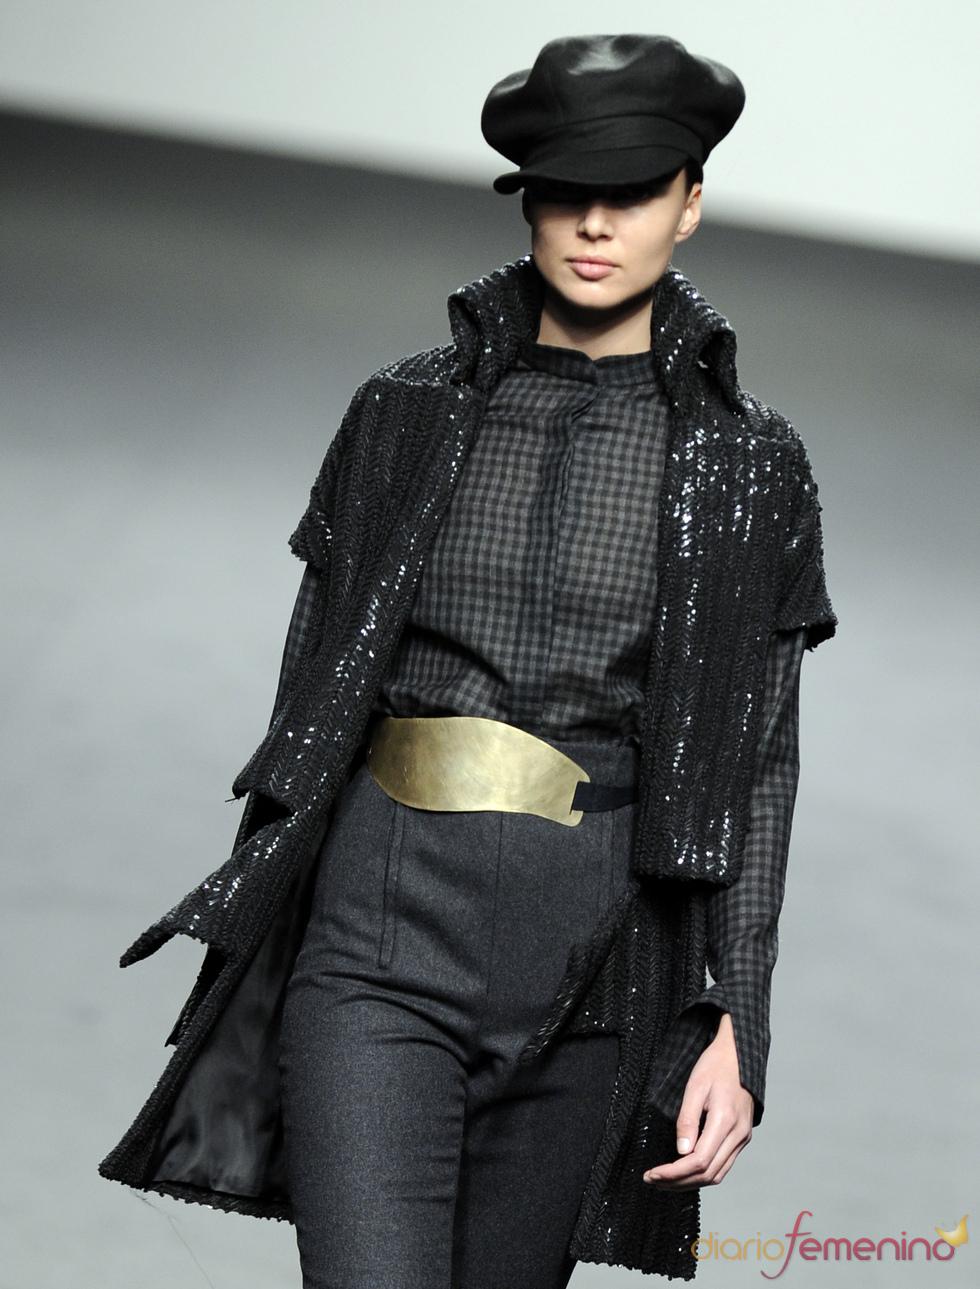 Tonos grises y negros. Jesús del Pozo O/I 2011-12. Cibeles Madrid Fashion Week